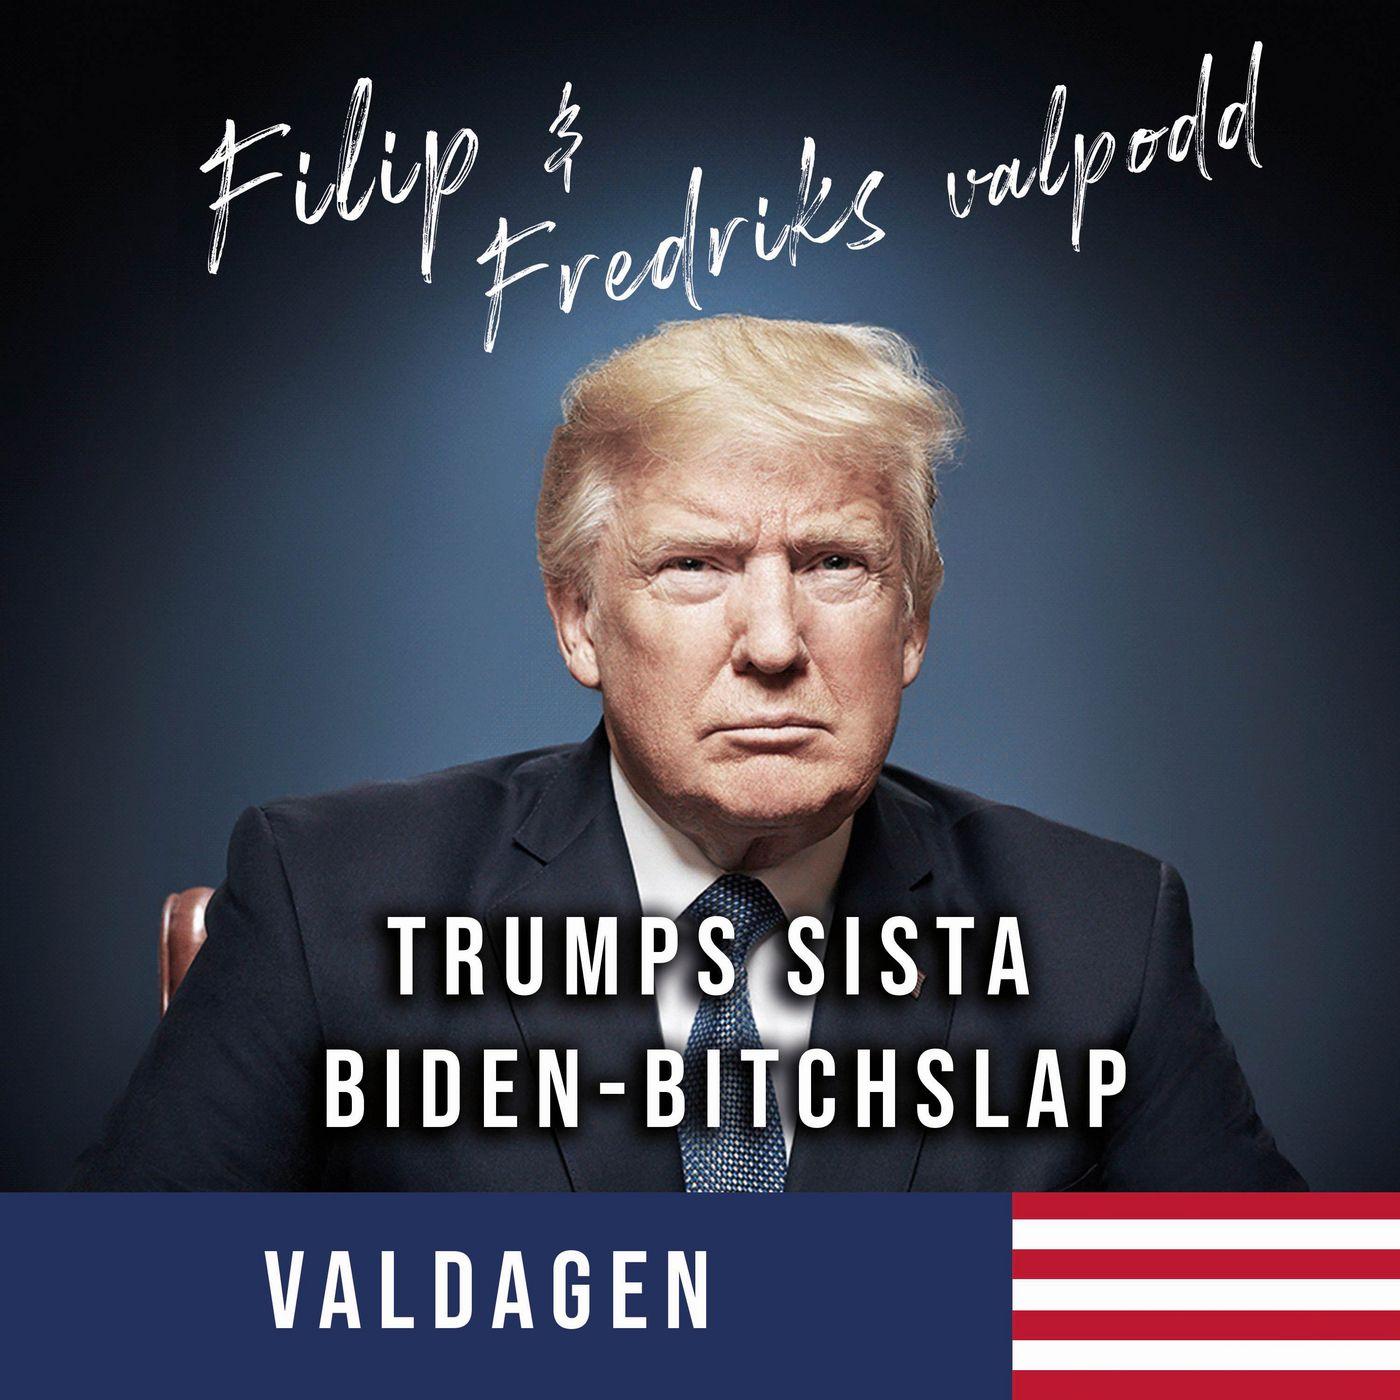 0 dagar kvar: Trumps sista Biden-bitchslap